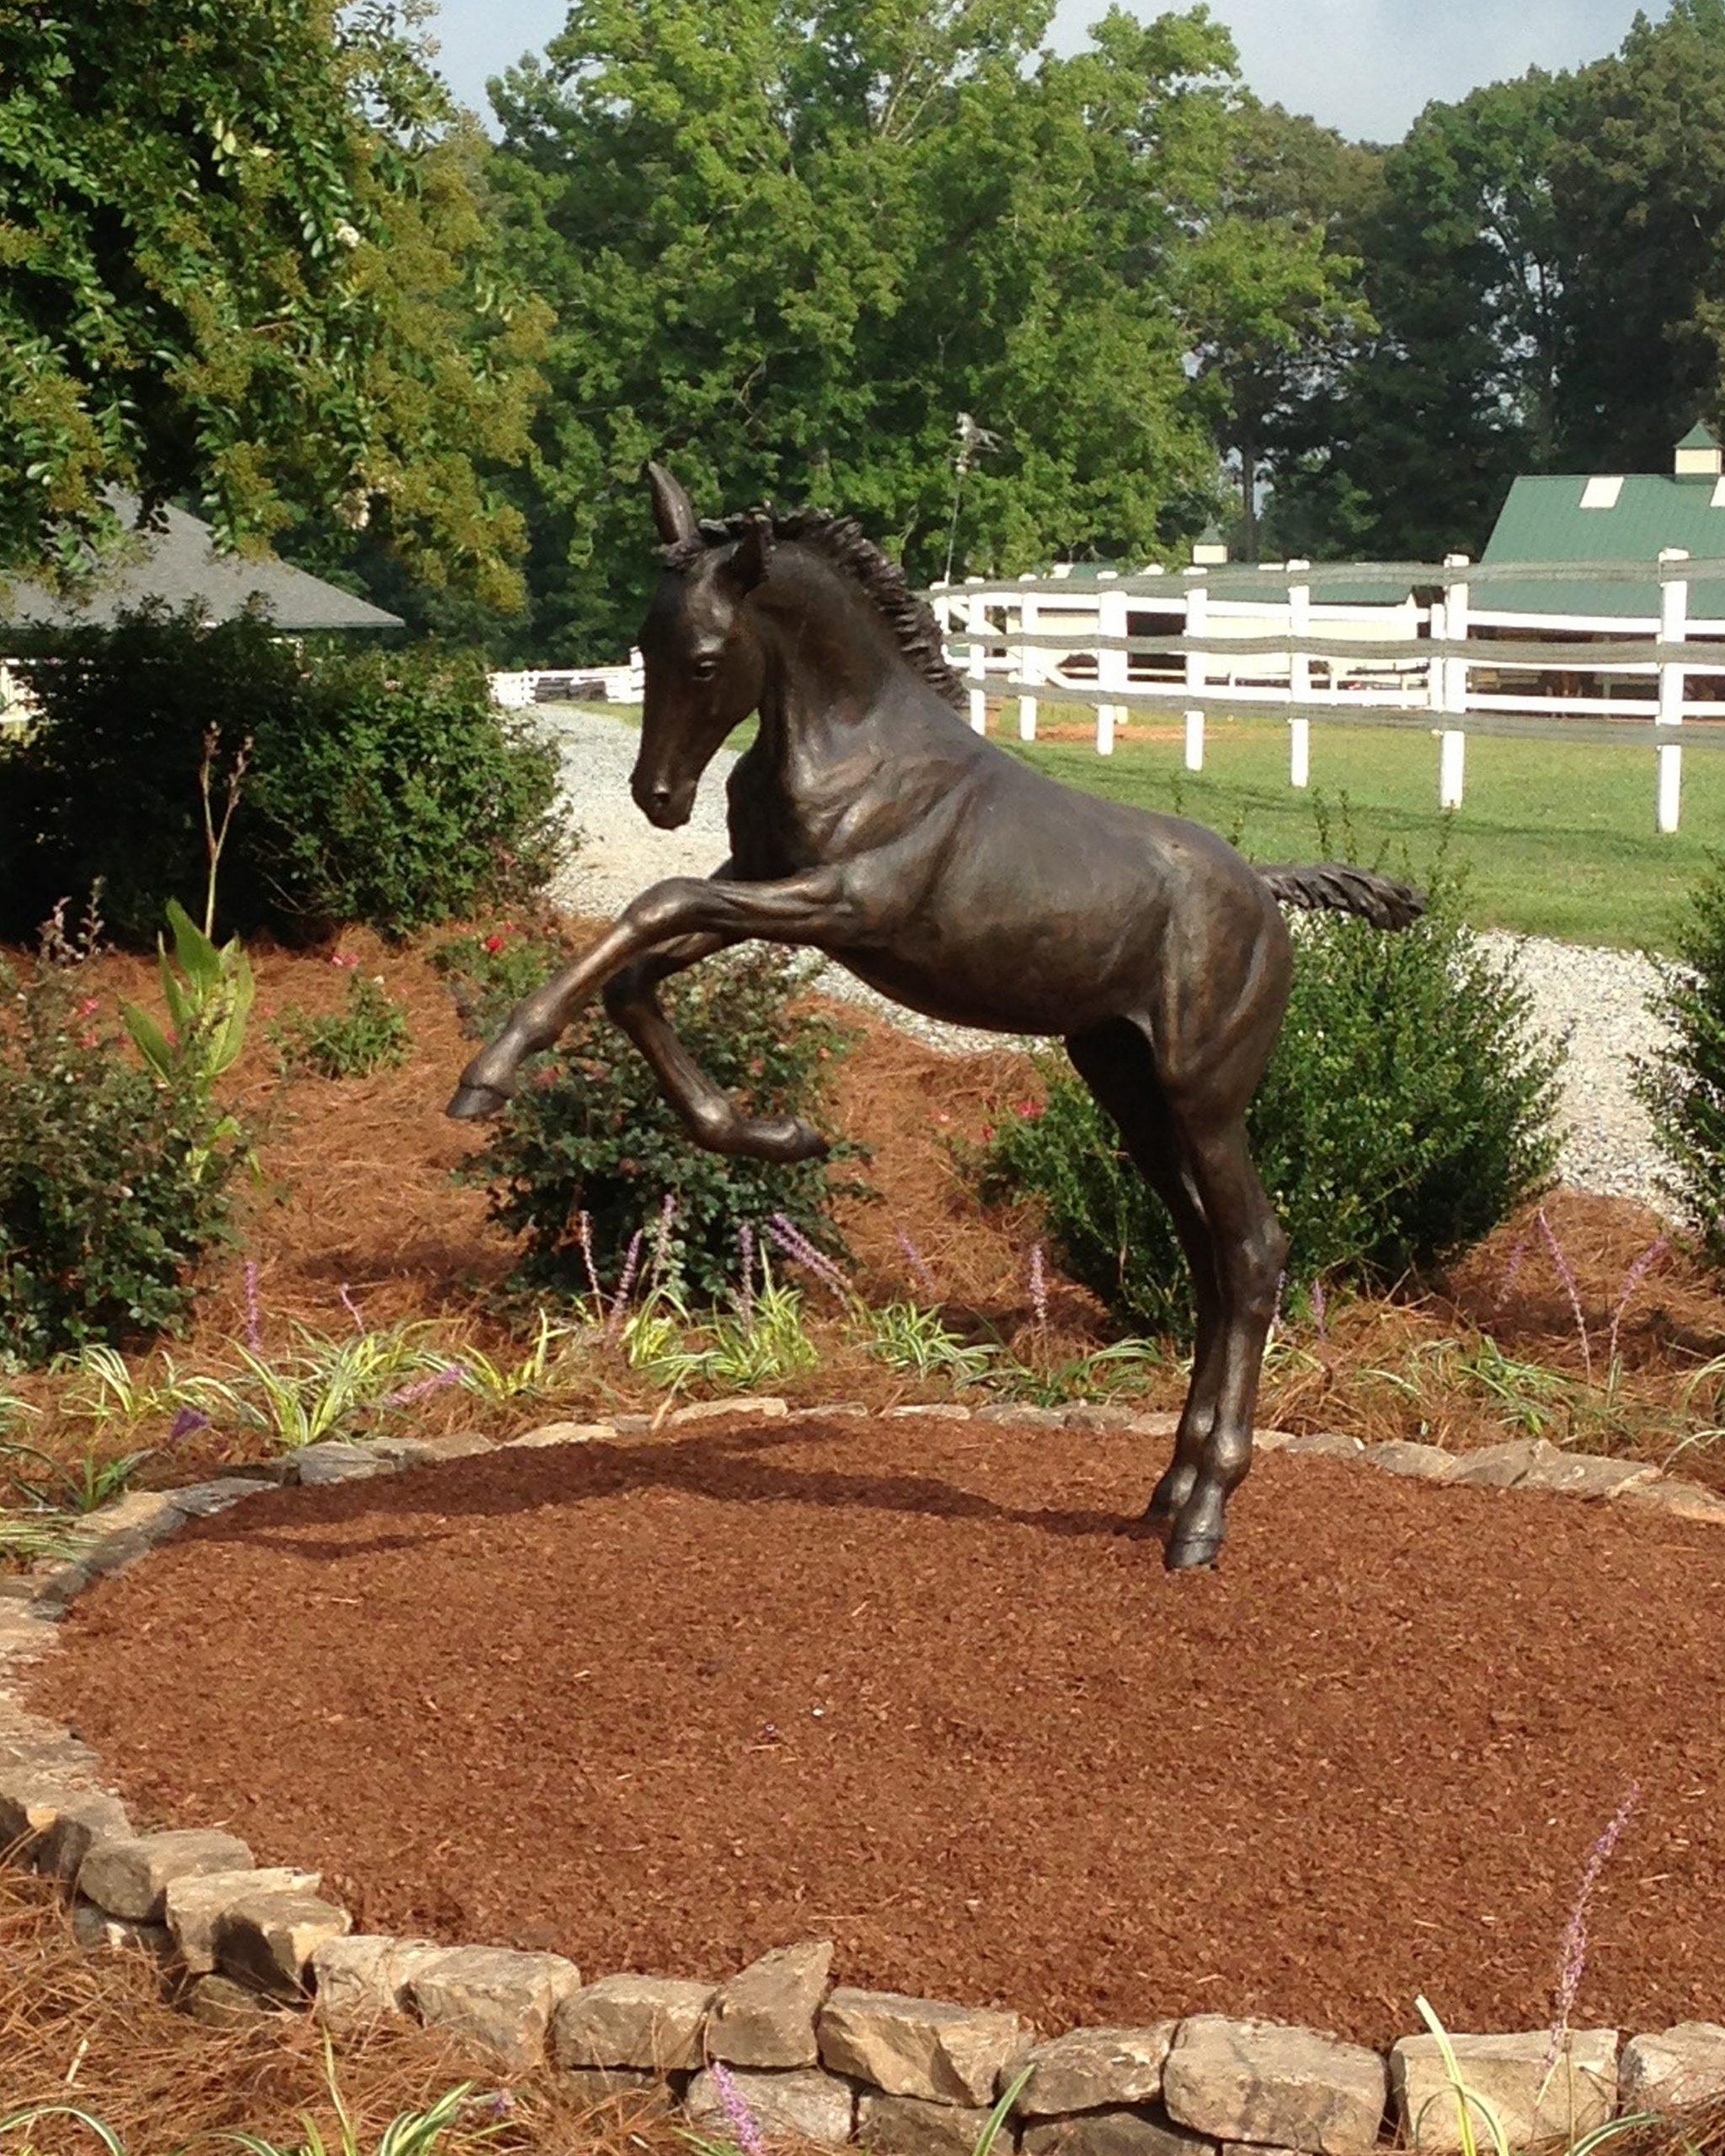 Frolicking Foal – Life-size bronze Foal